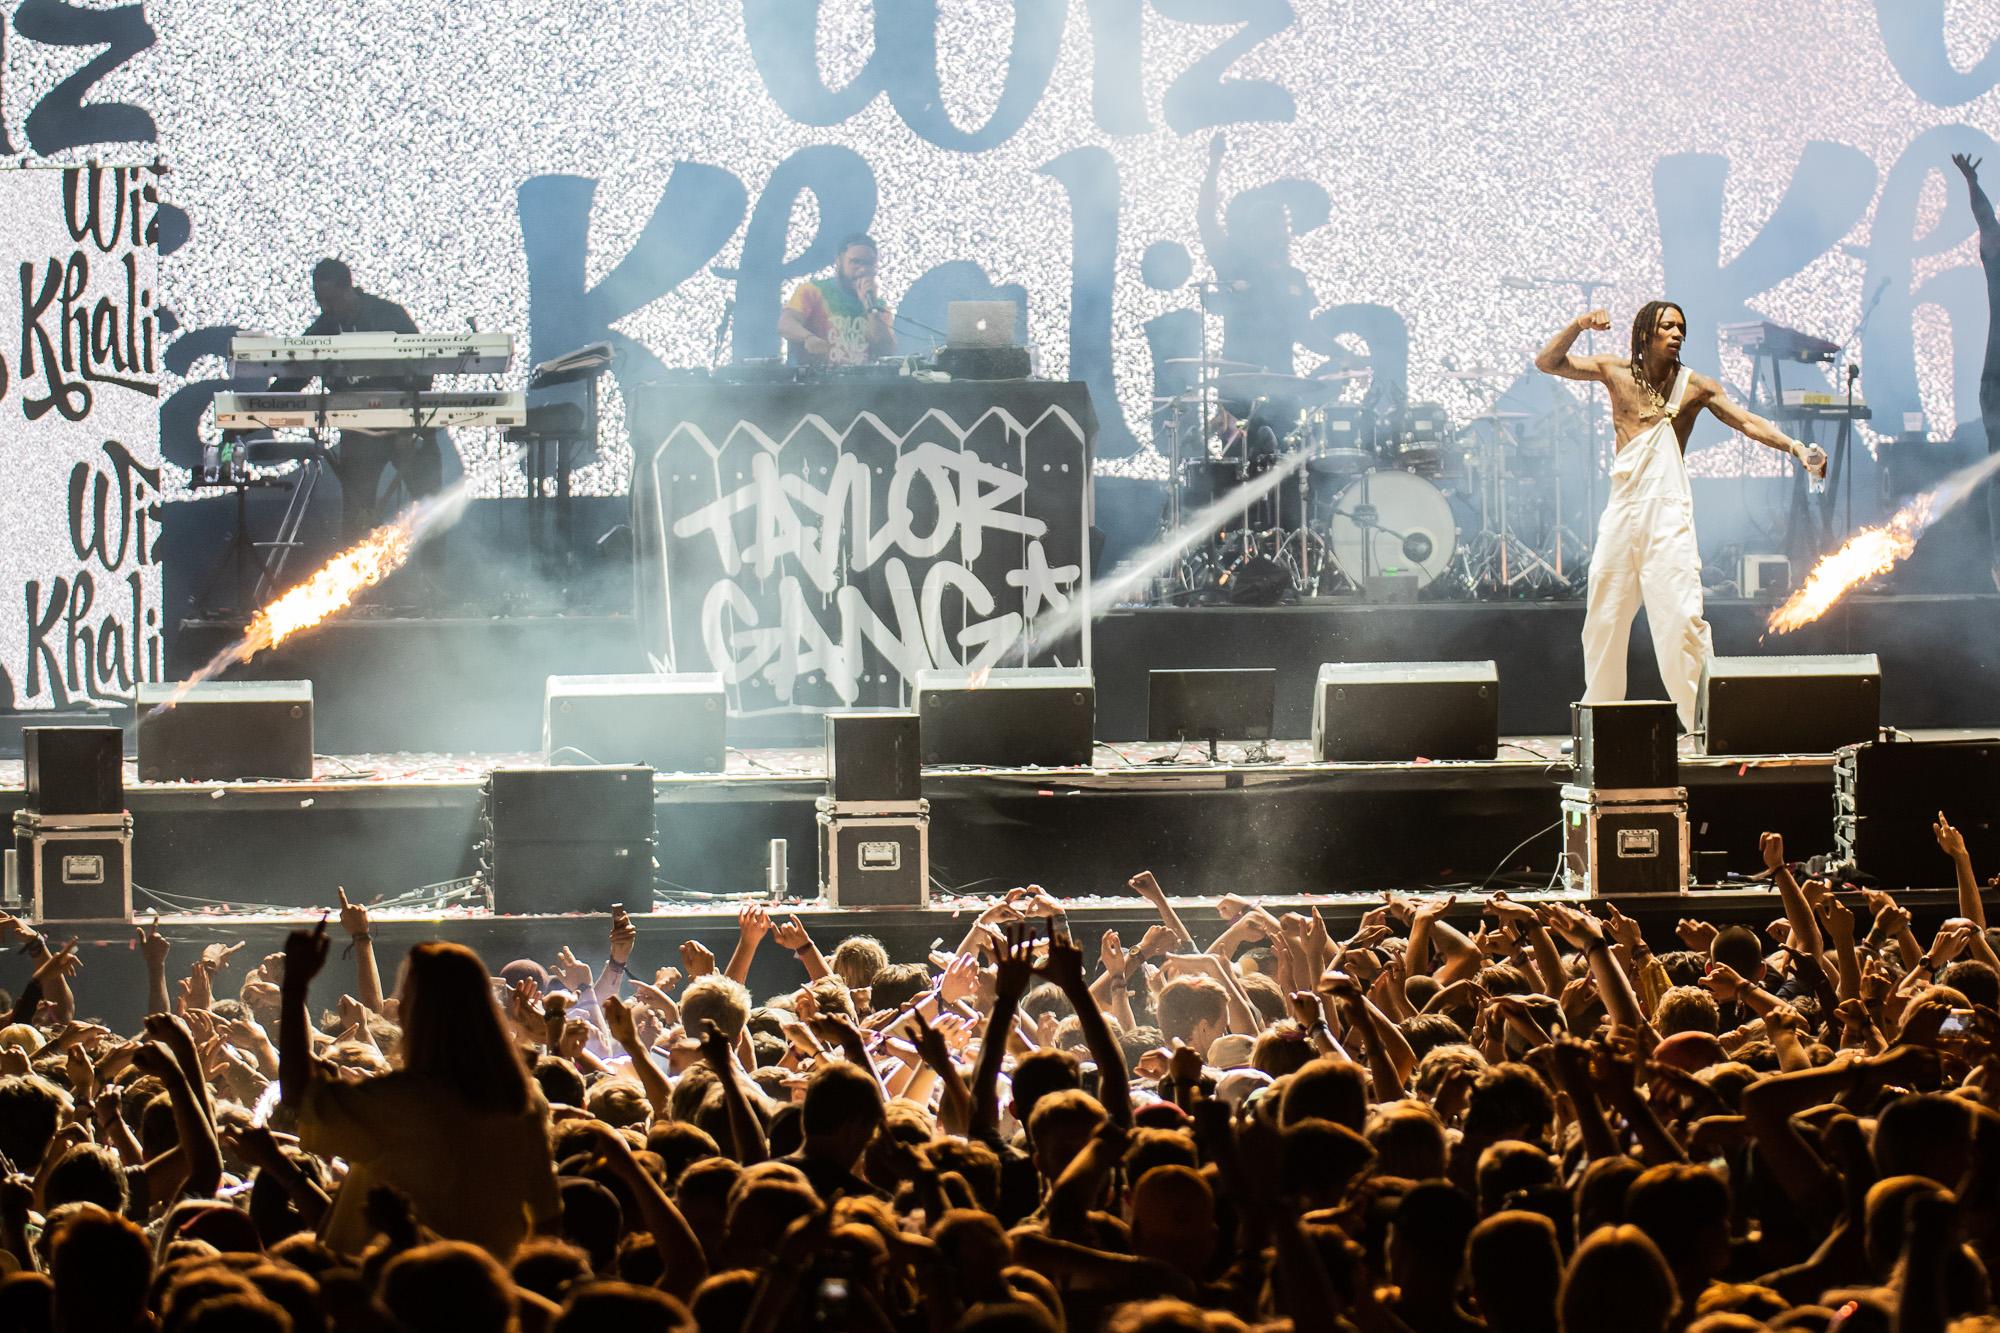 Wiz Khalifa @ Stavernfestivalen 2018